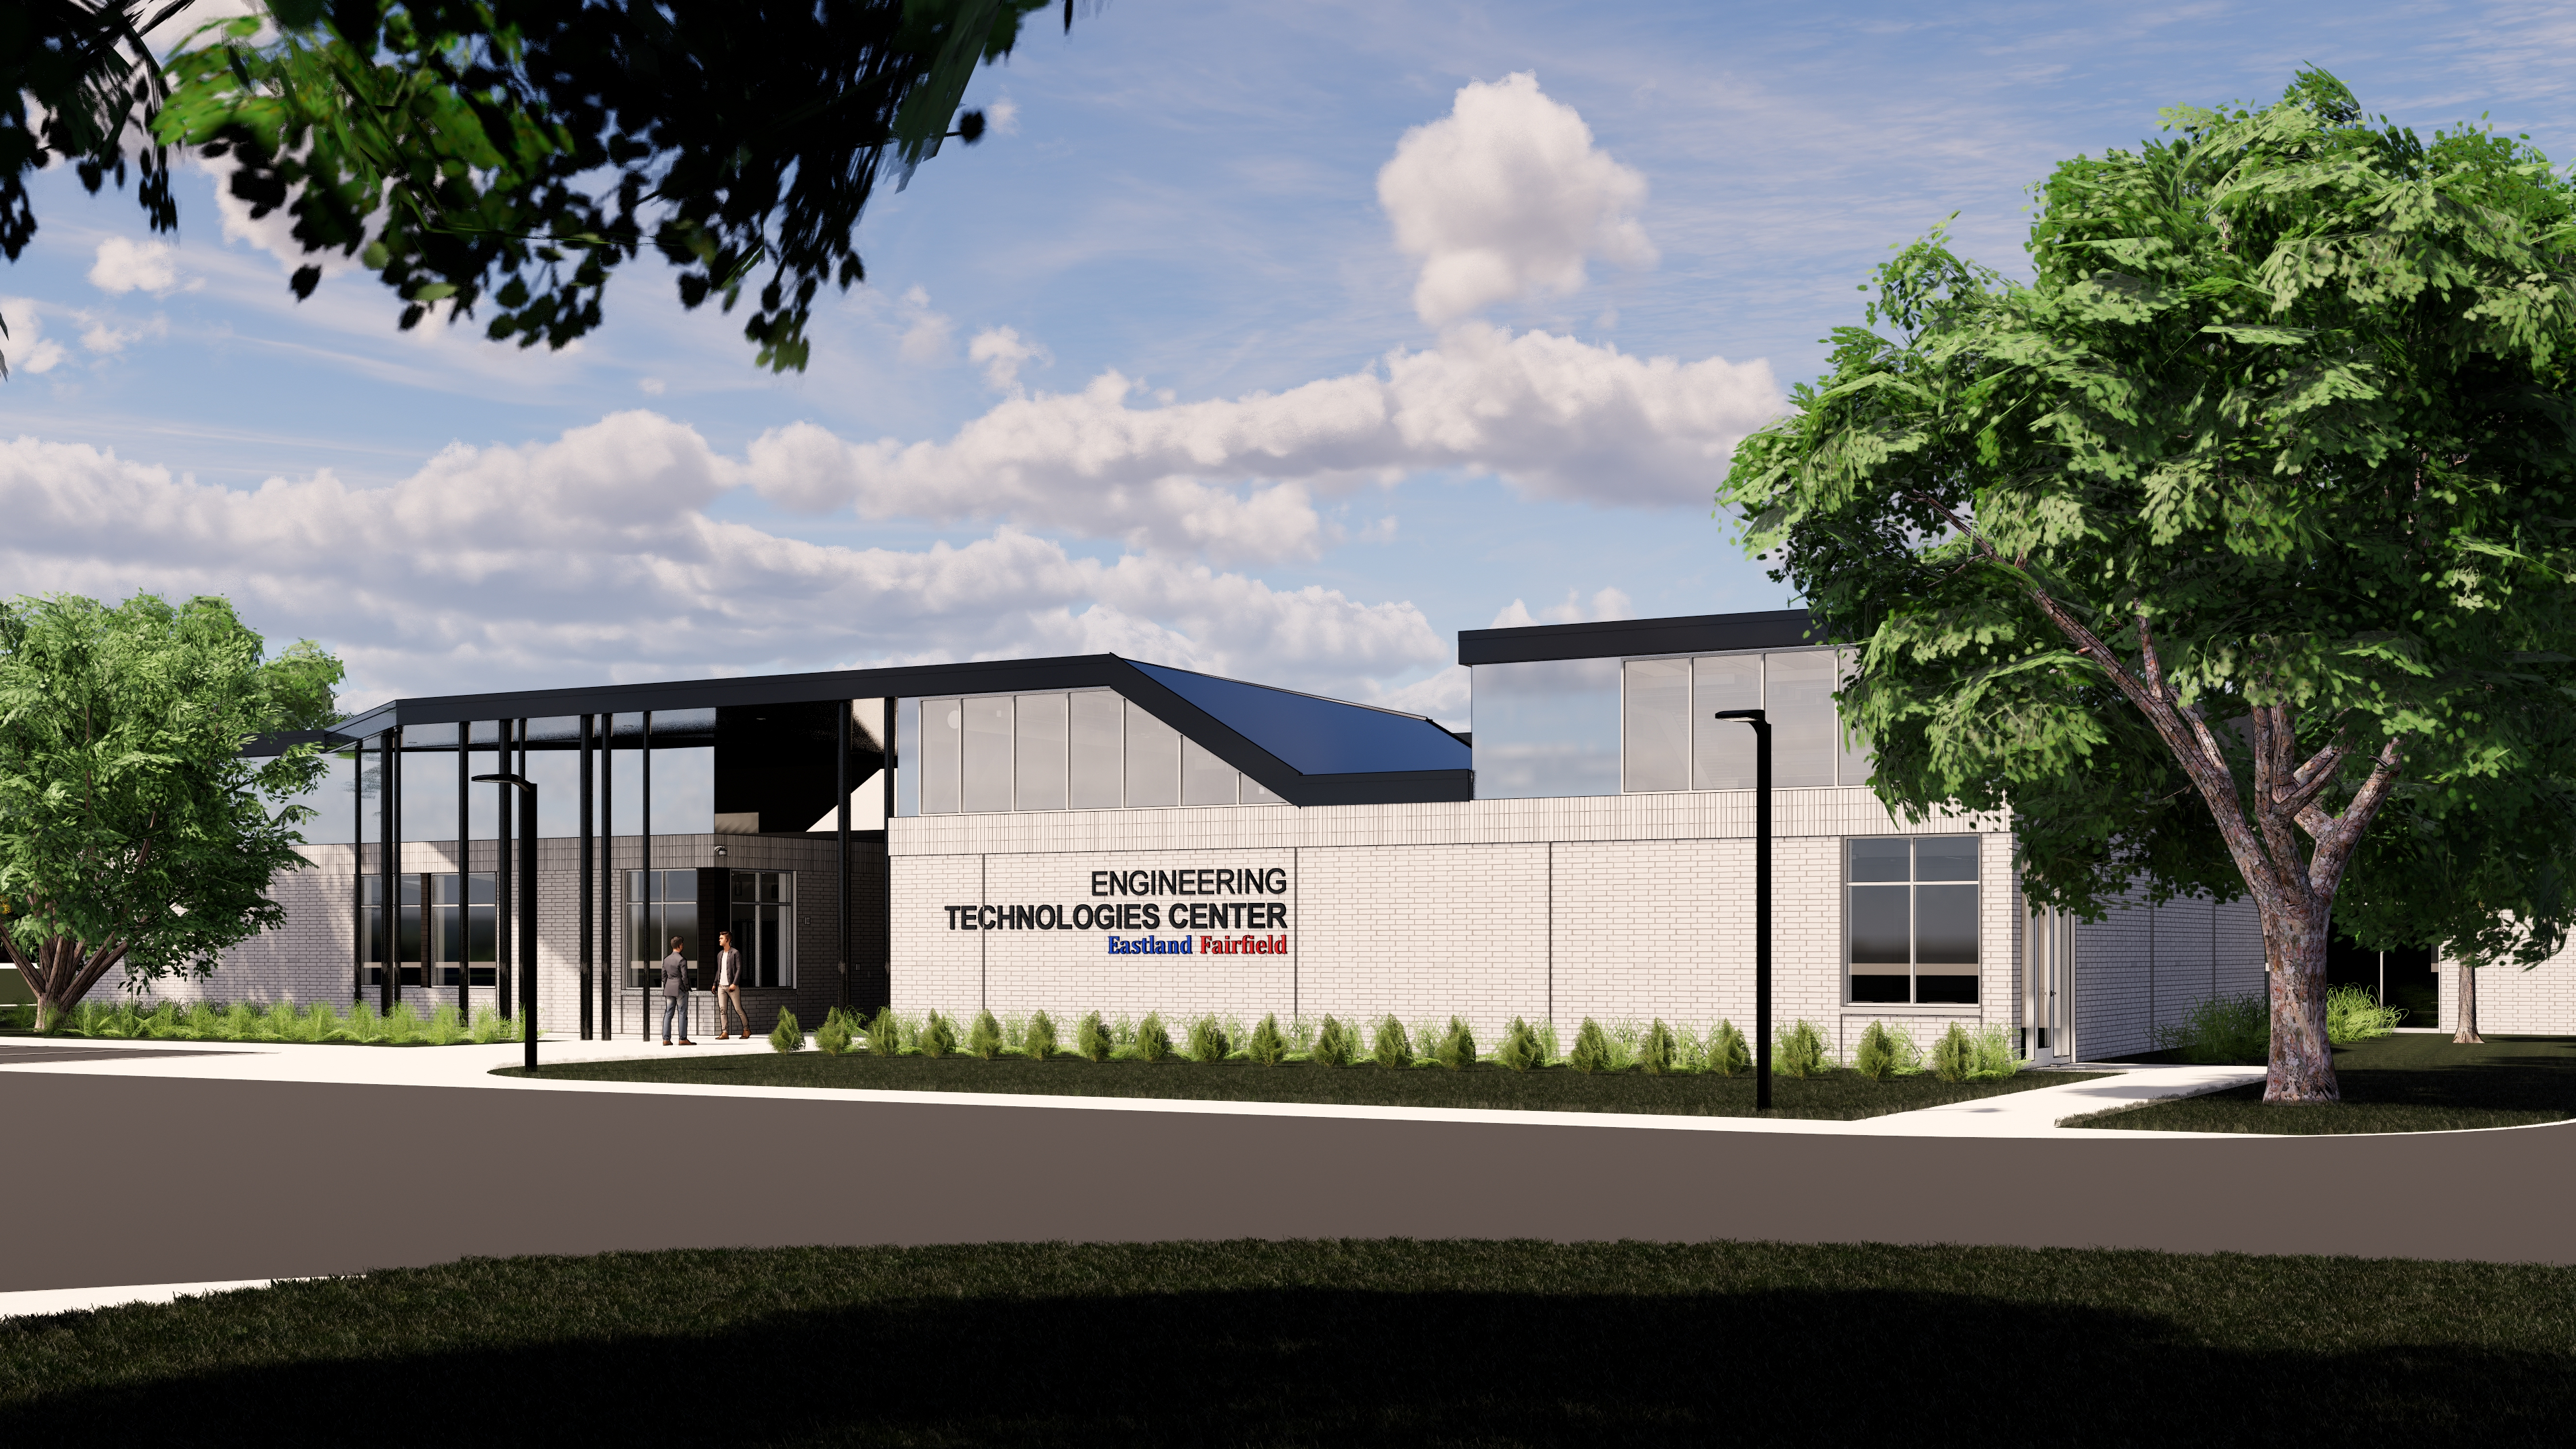 Rendering of Engineering Technologies Center